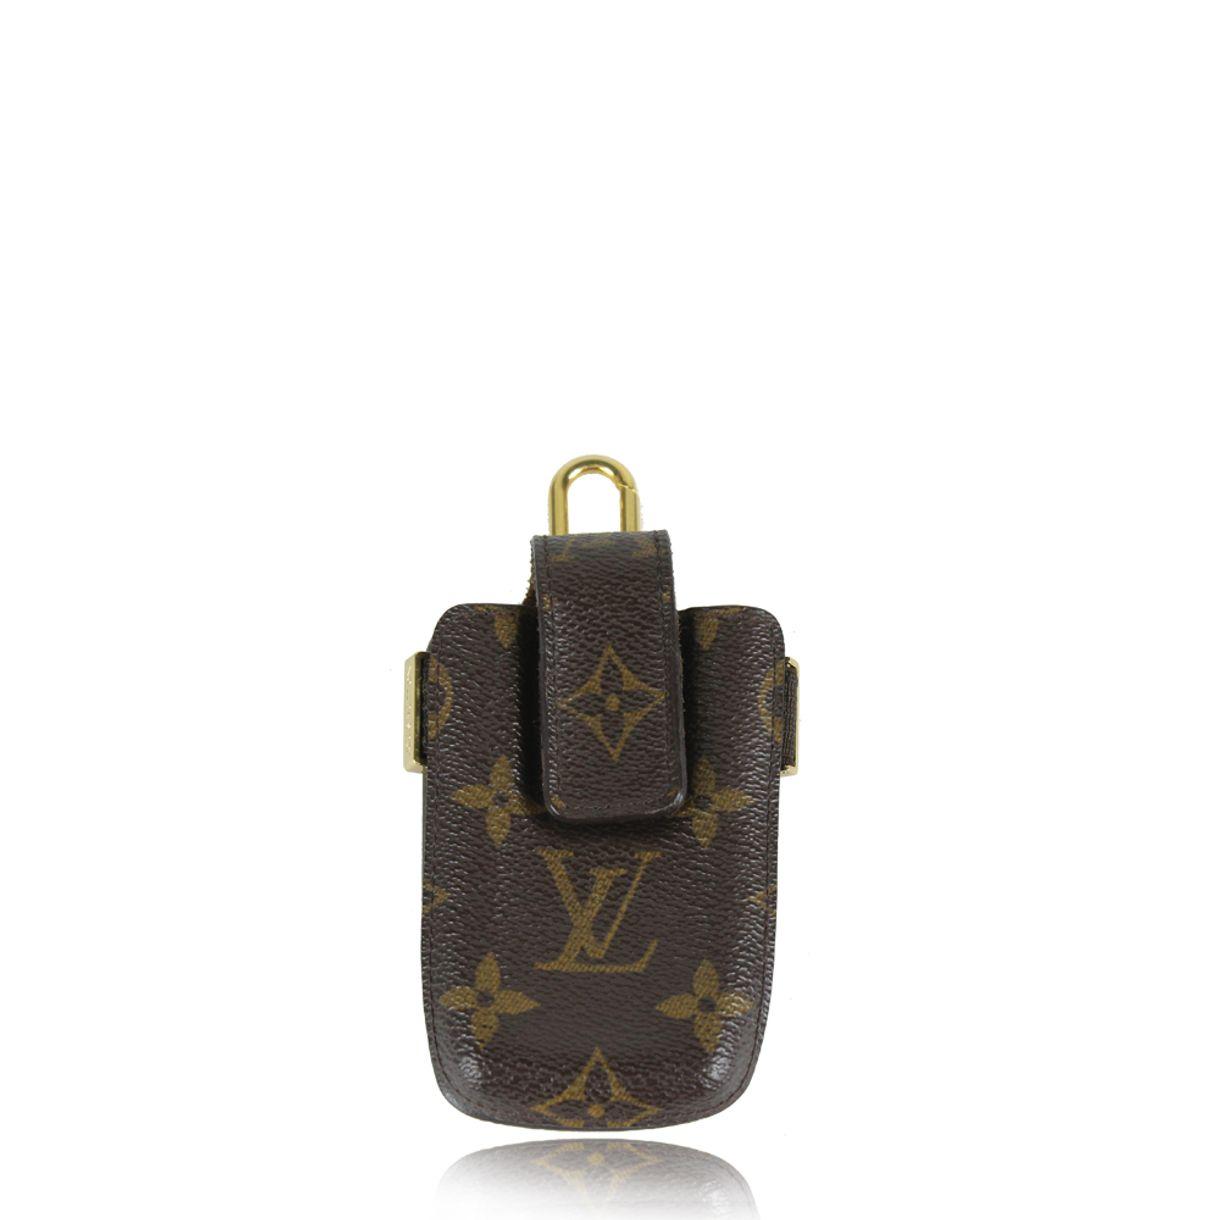 c0c0eaef2 Bolsa Louis Vuitton Neverfull GM | Brechó de luxo - prettynew